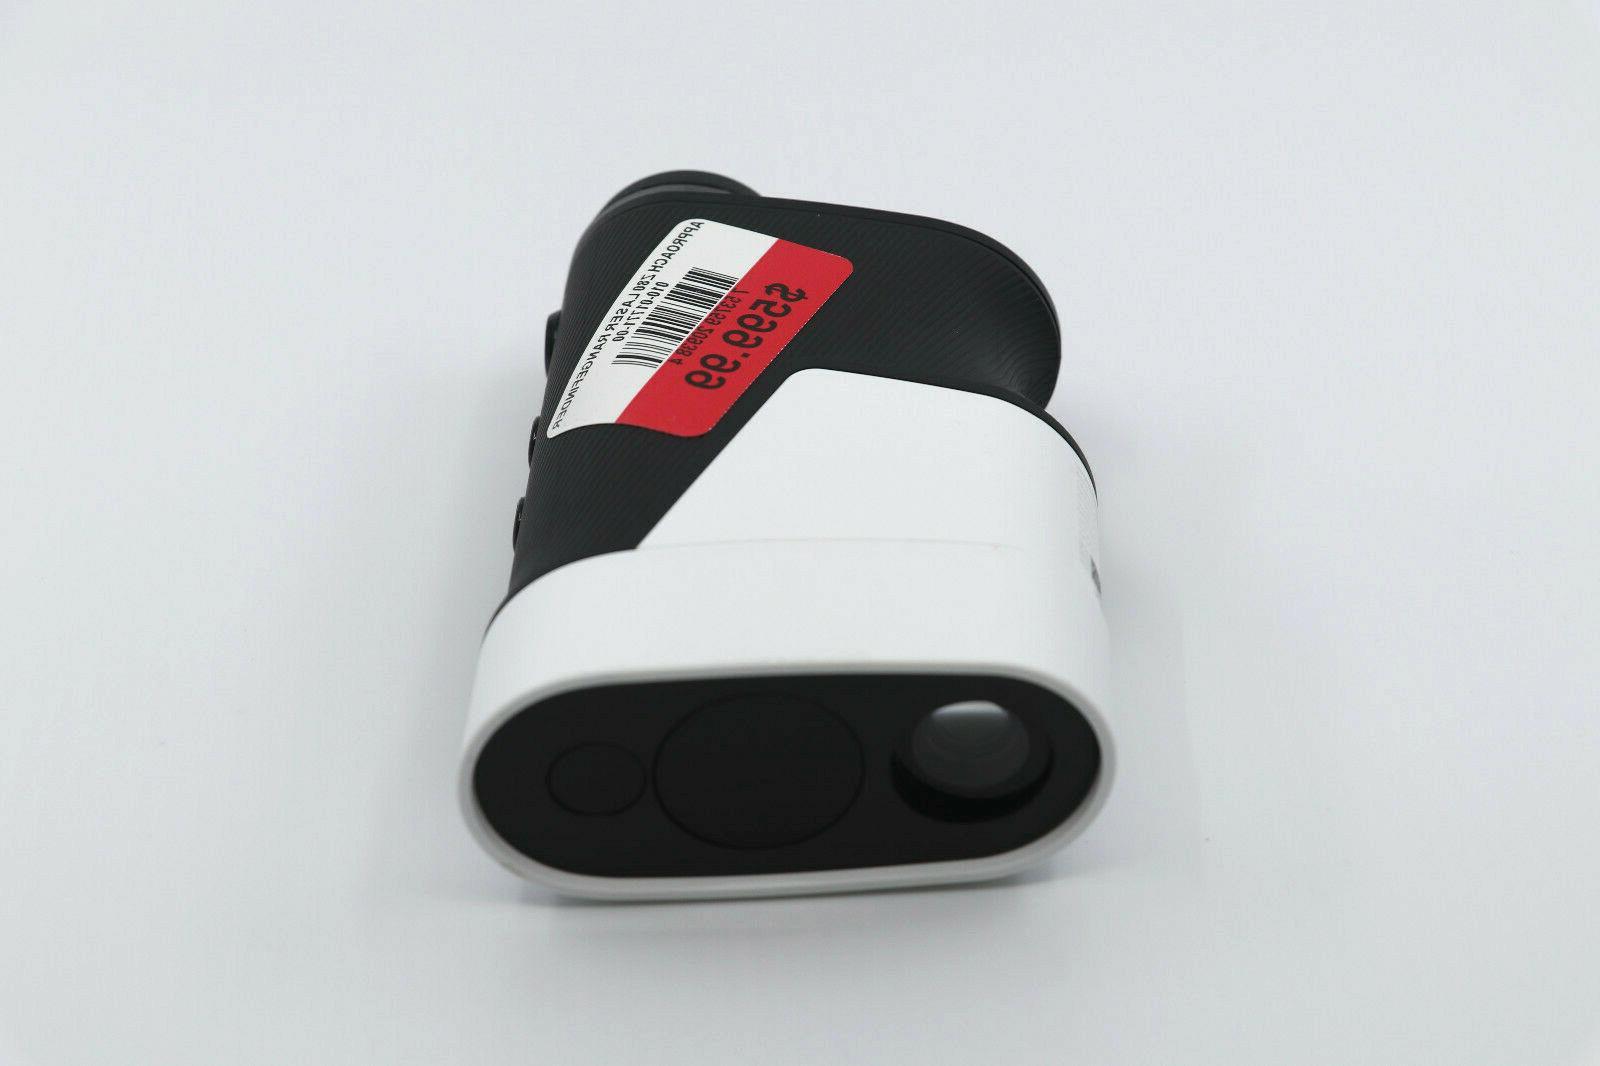 Garmin Laser Rangefinder Courses Combo